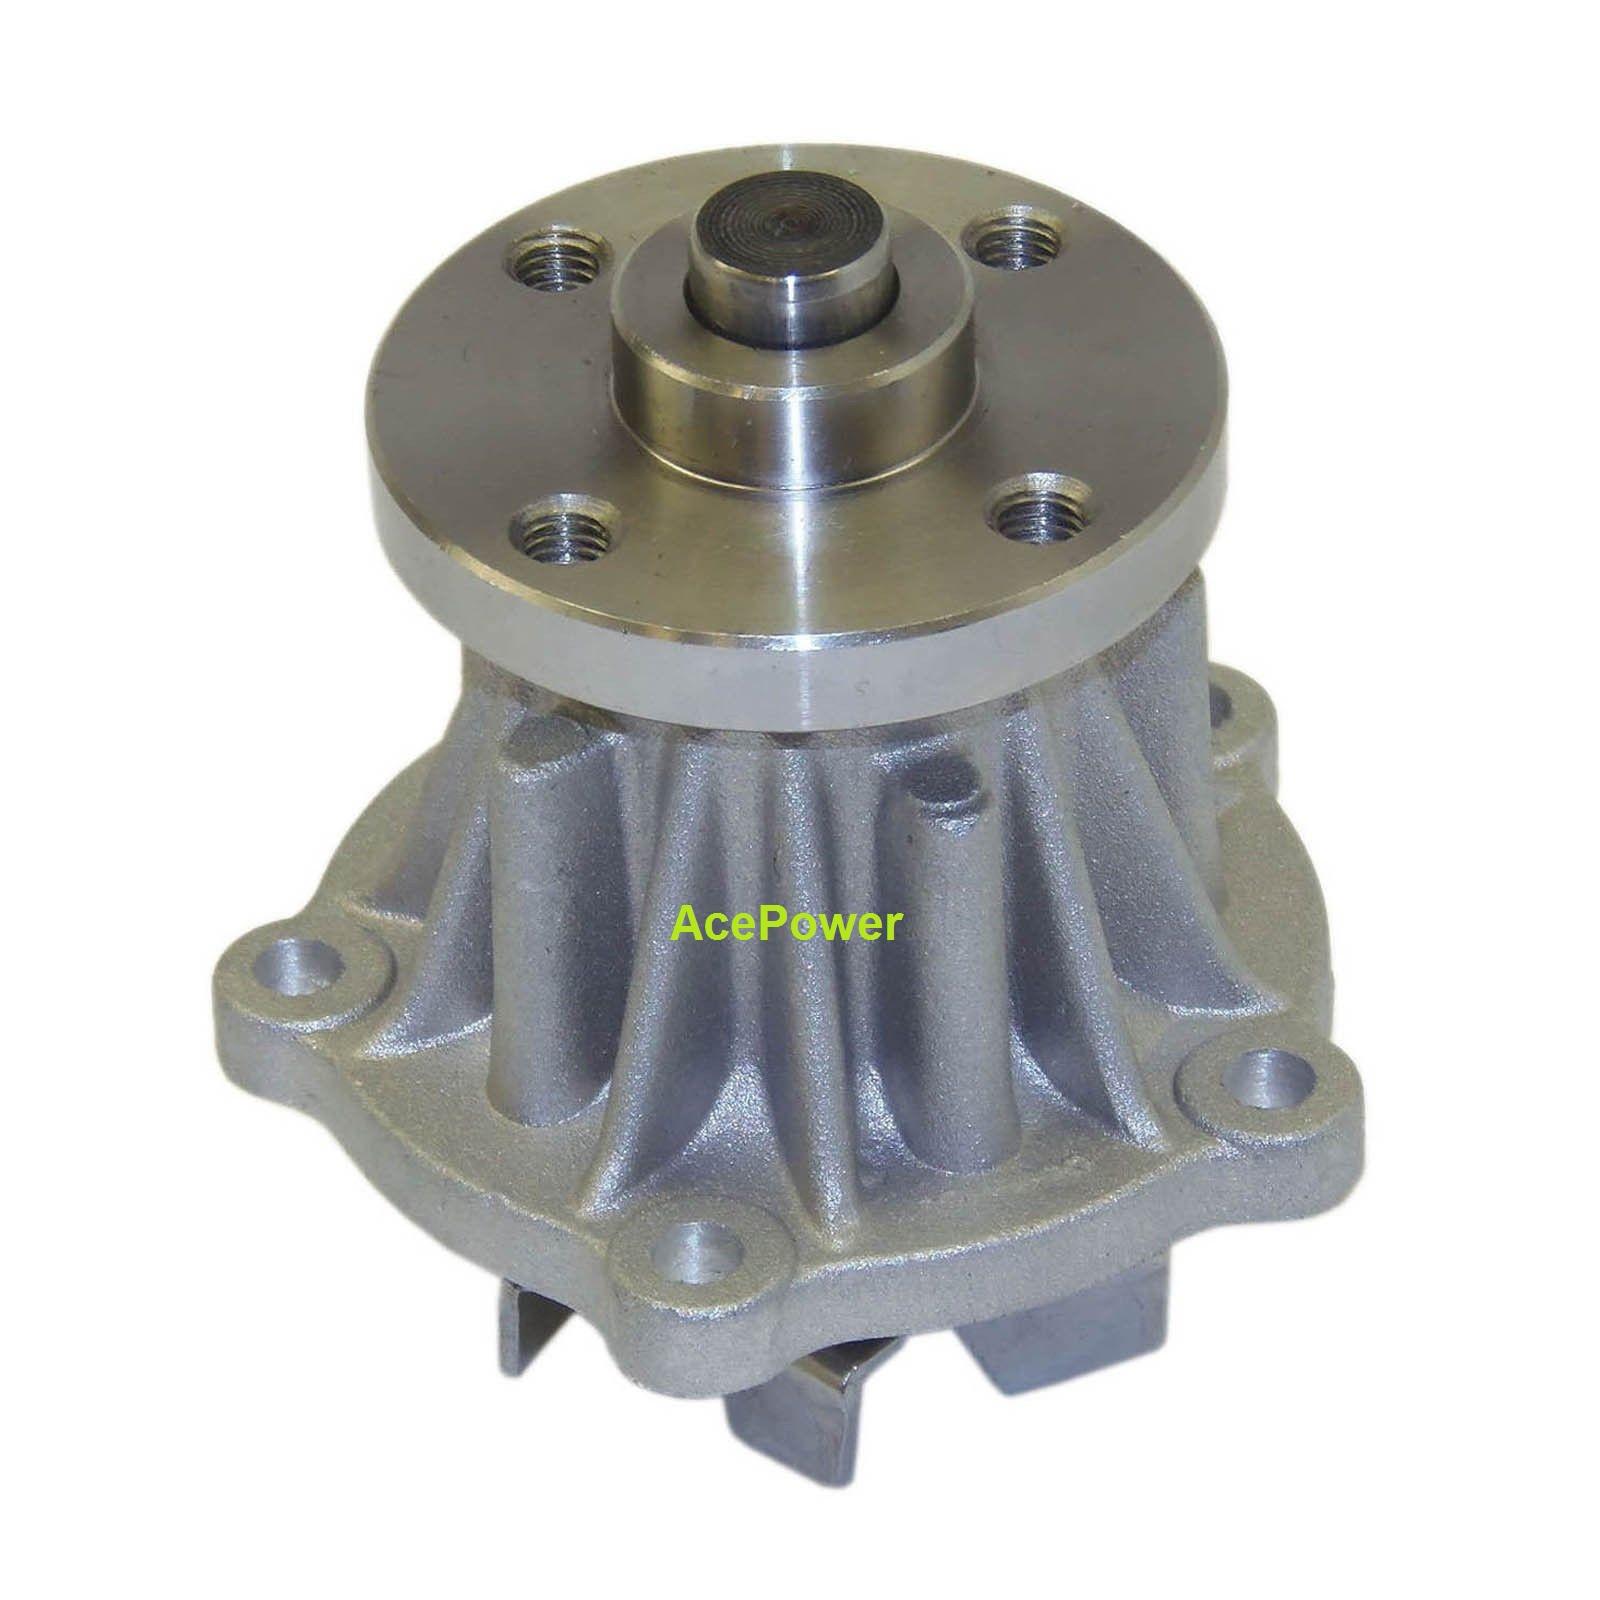 Toyota Forklift Water Pump 16120-78151-71